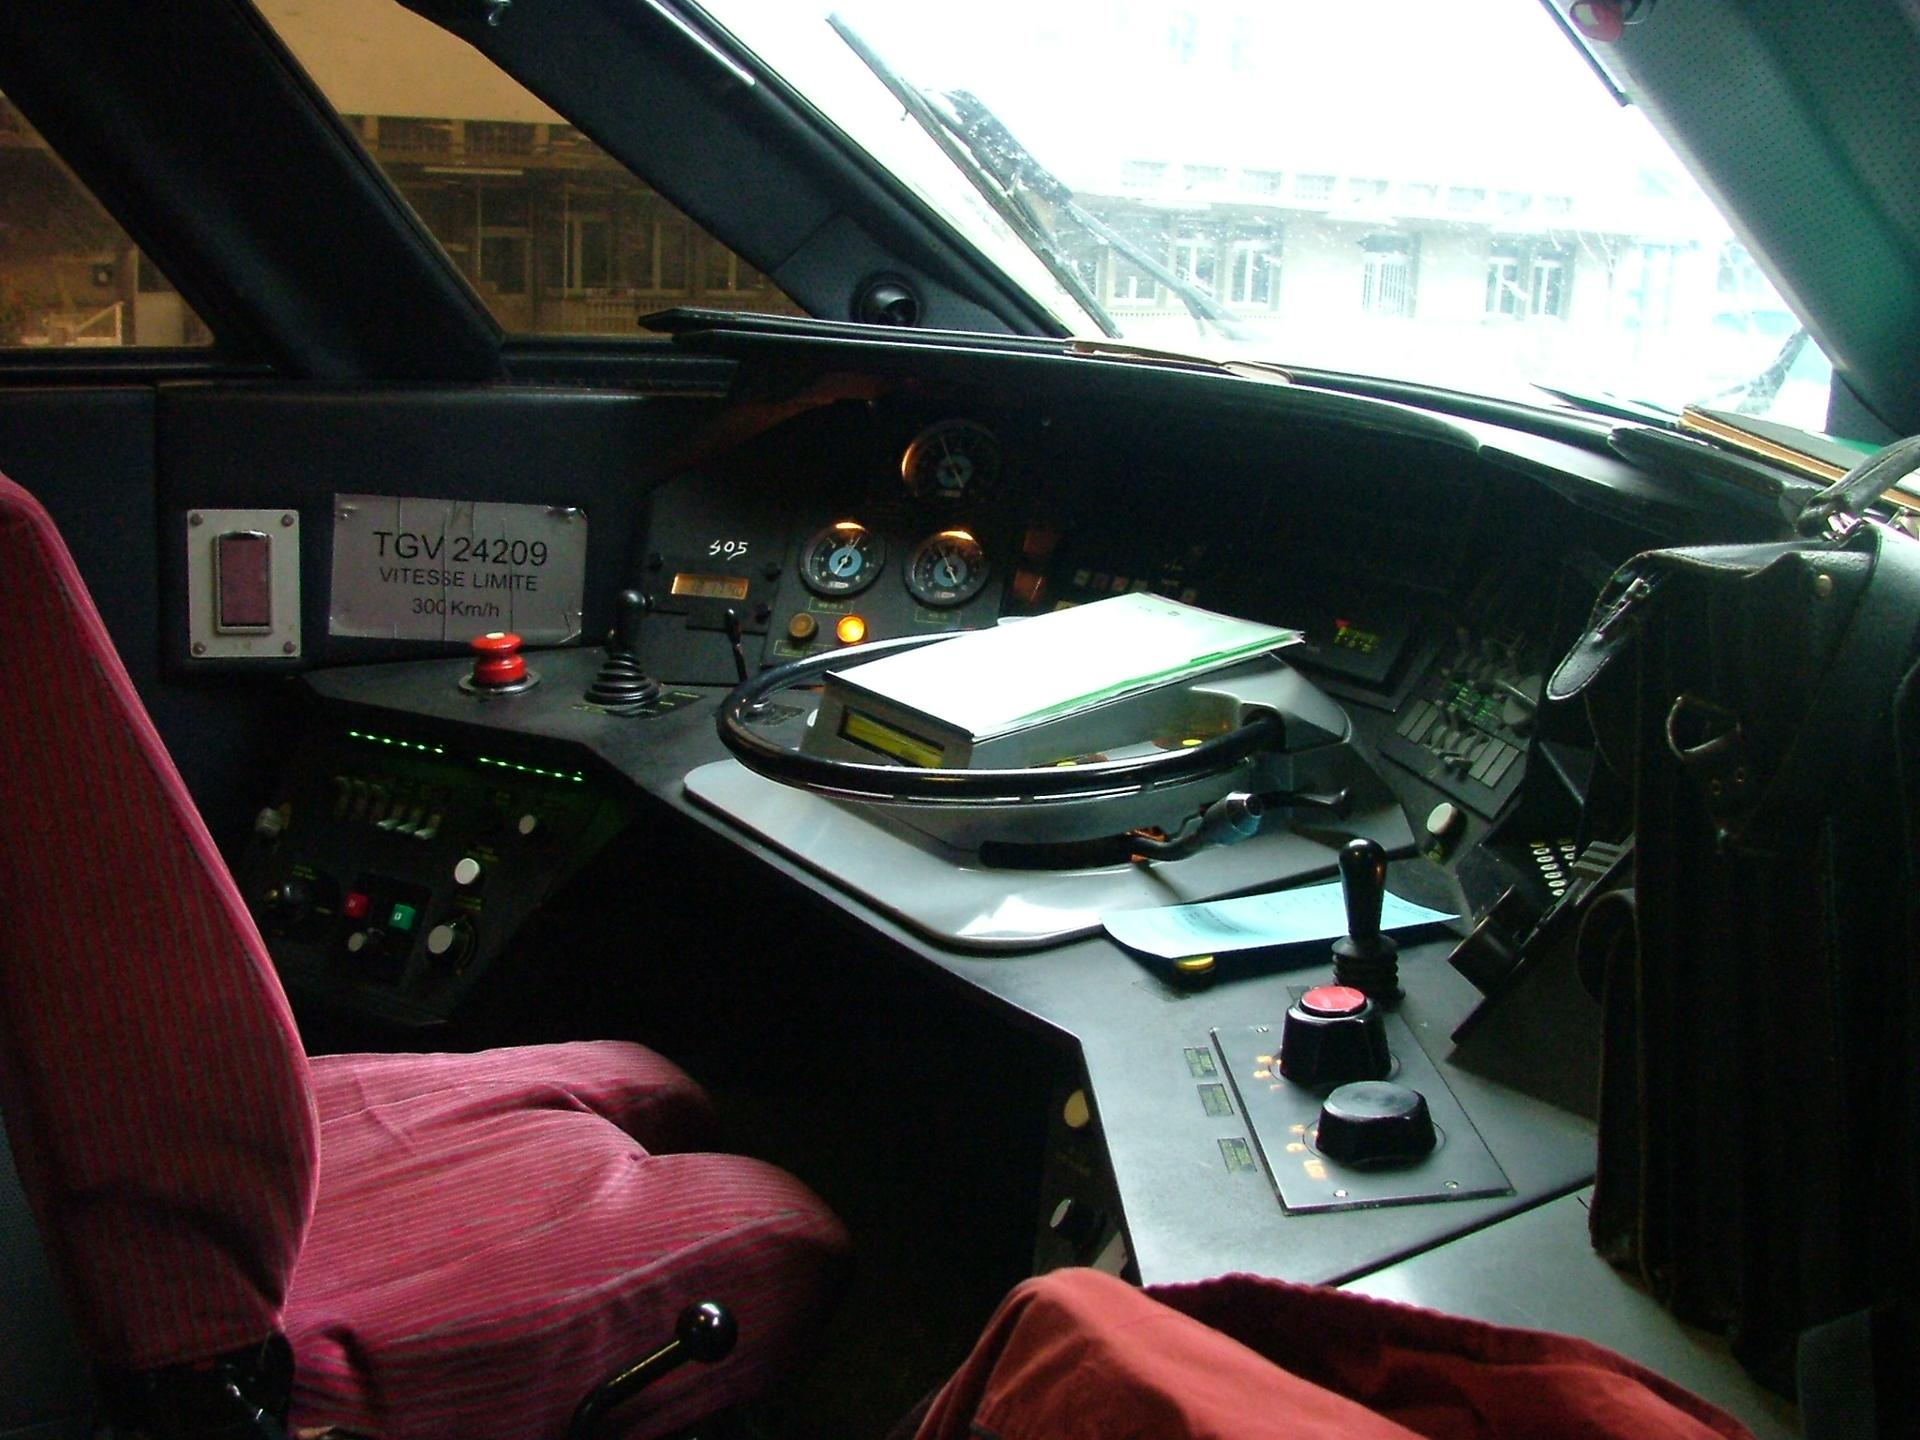 Cabine pilotage TGV - Gare de Nantes-1